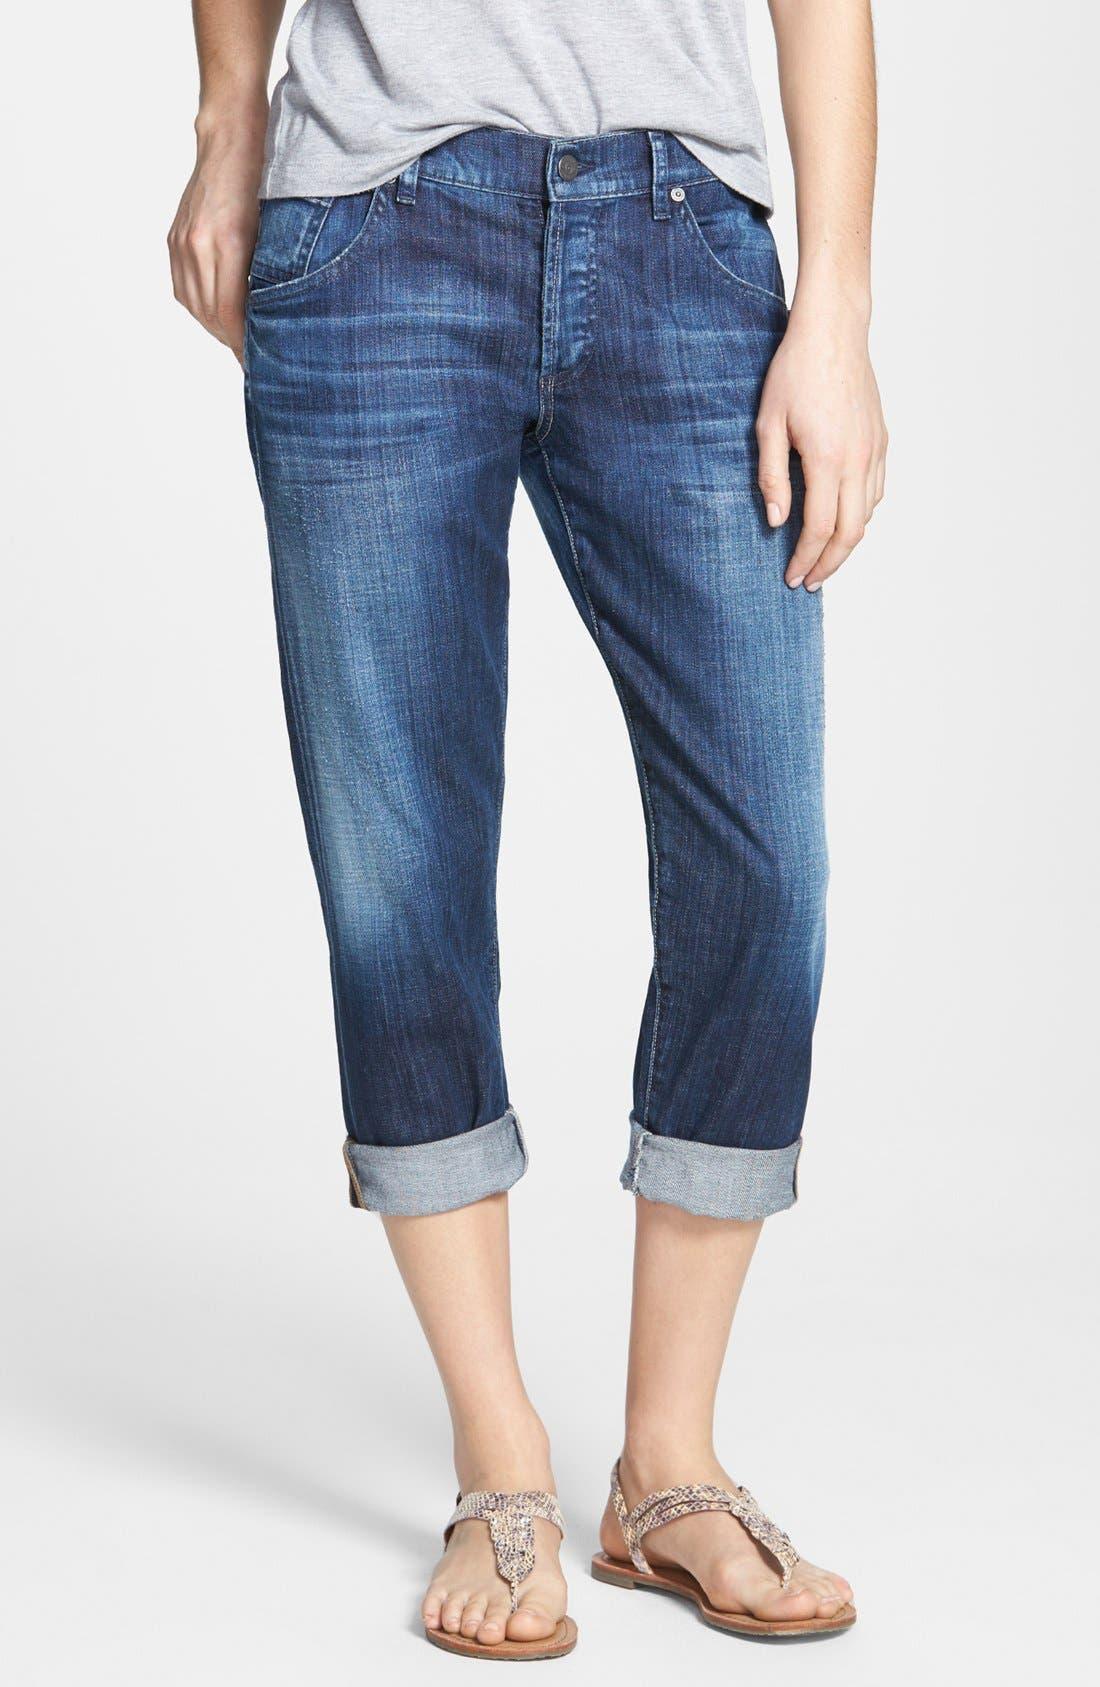 Main Image - Citizens of Humanity 'Skyler' Crop Boyfriend Jeans (Vista)